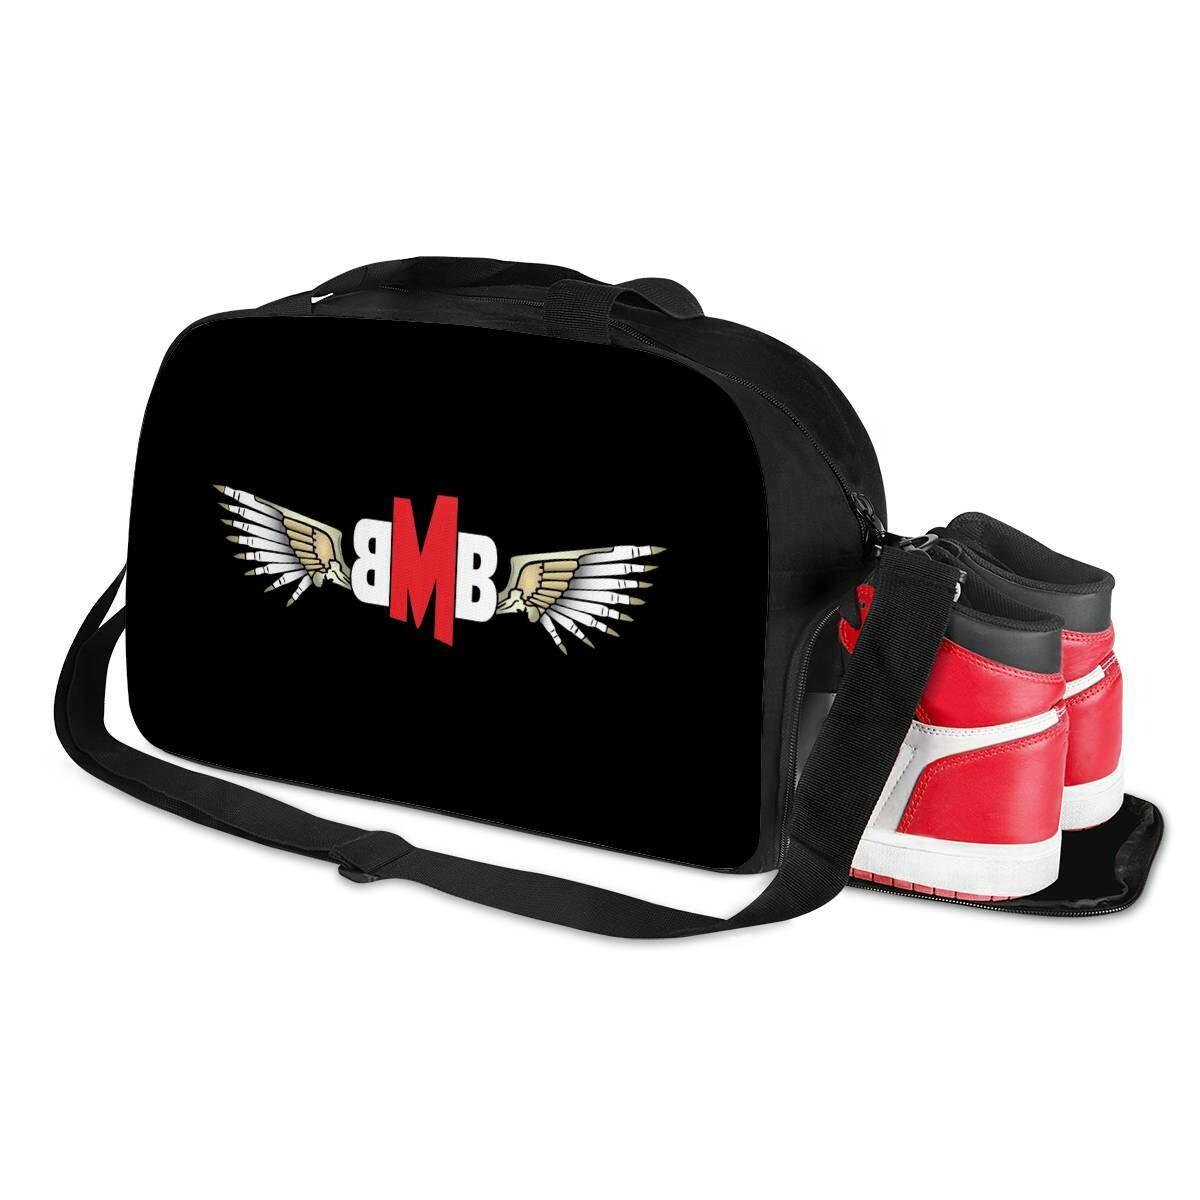 Travel Luggage Bag